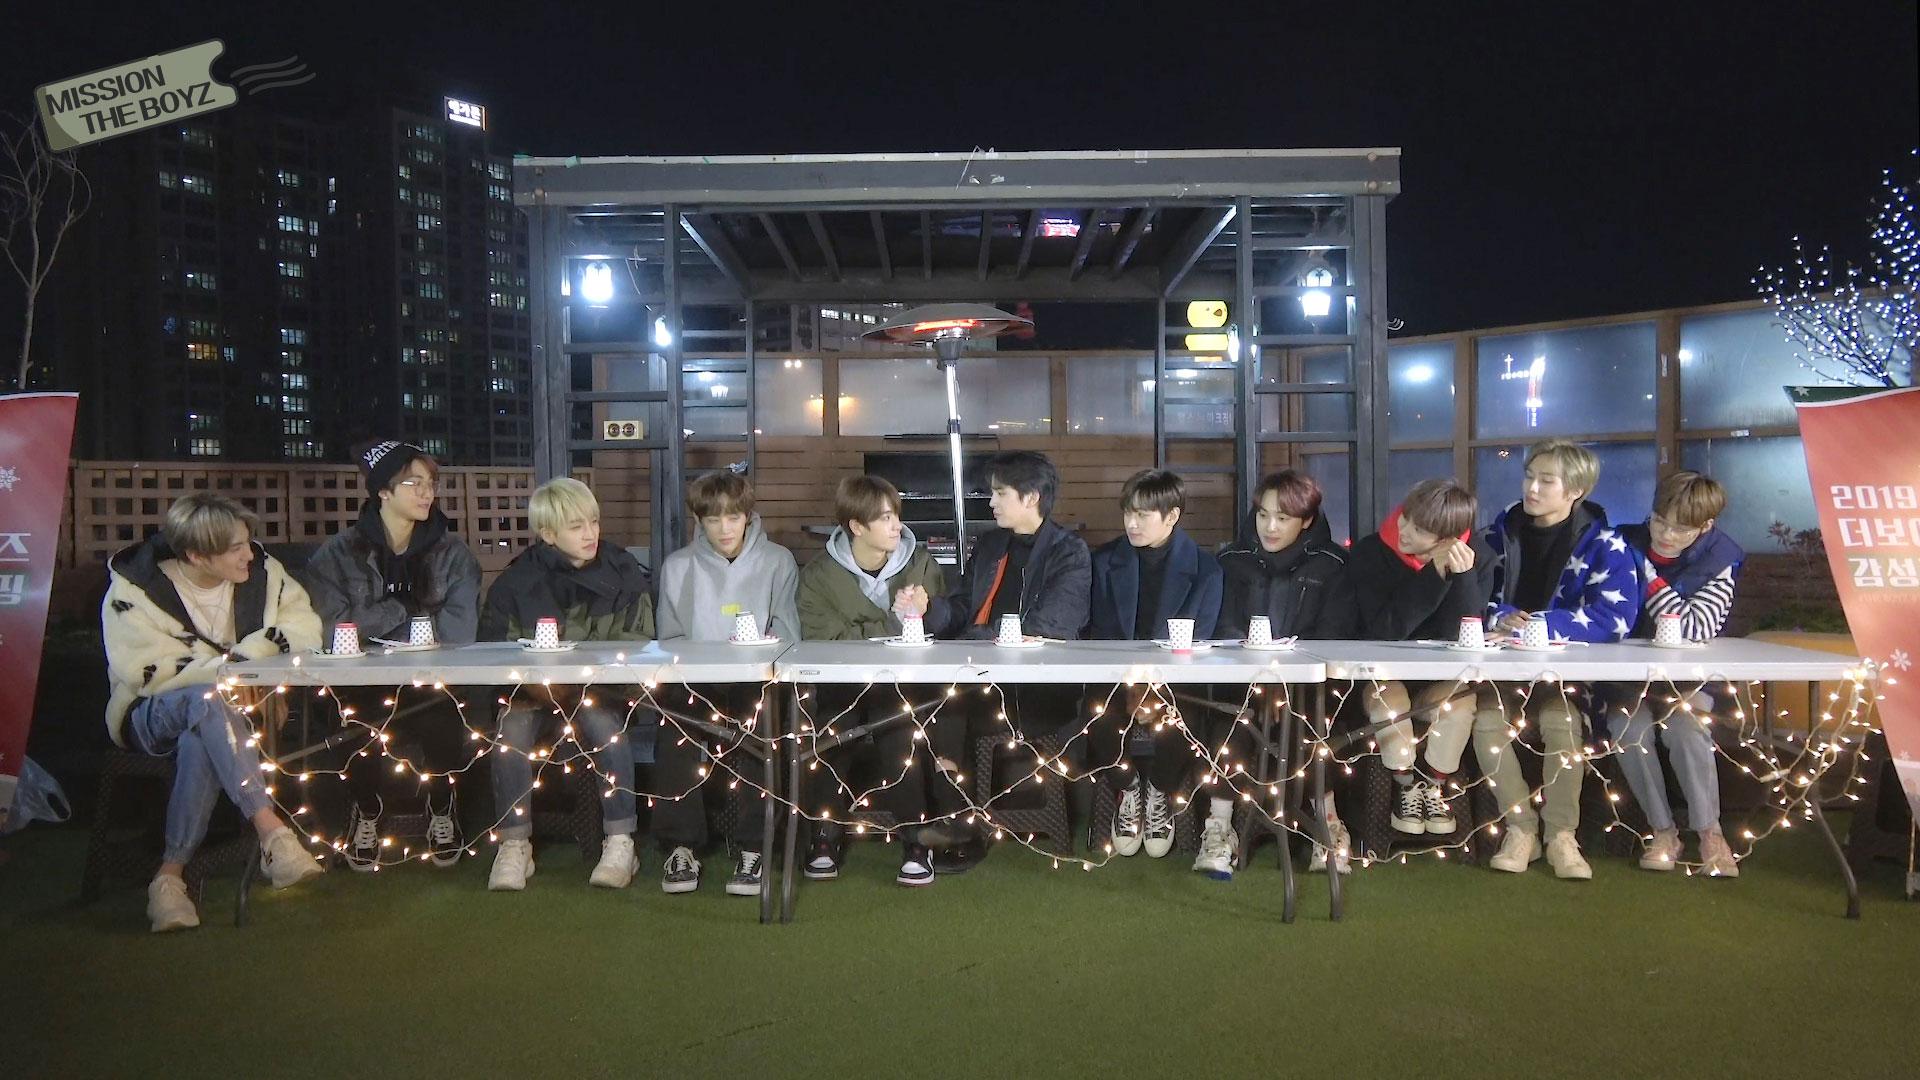 [MISSION THE BOYZ] 2019 감성캠핑